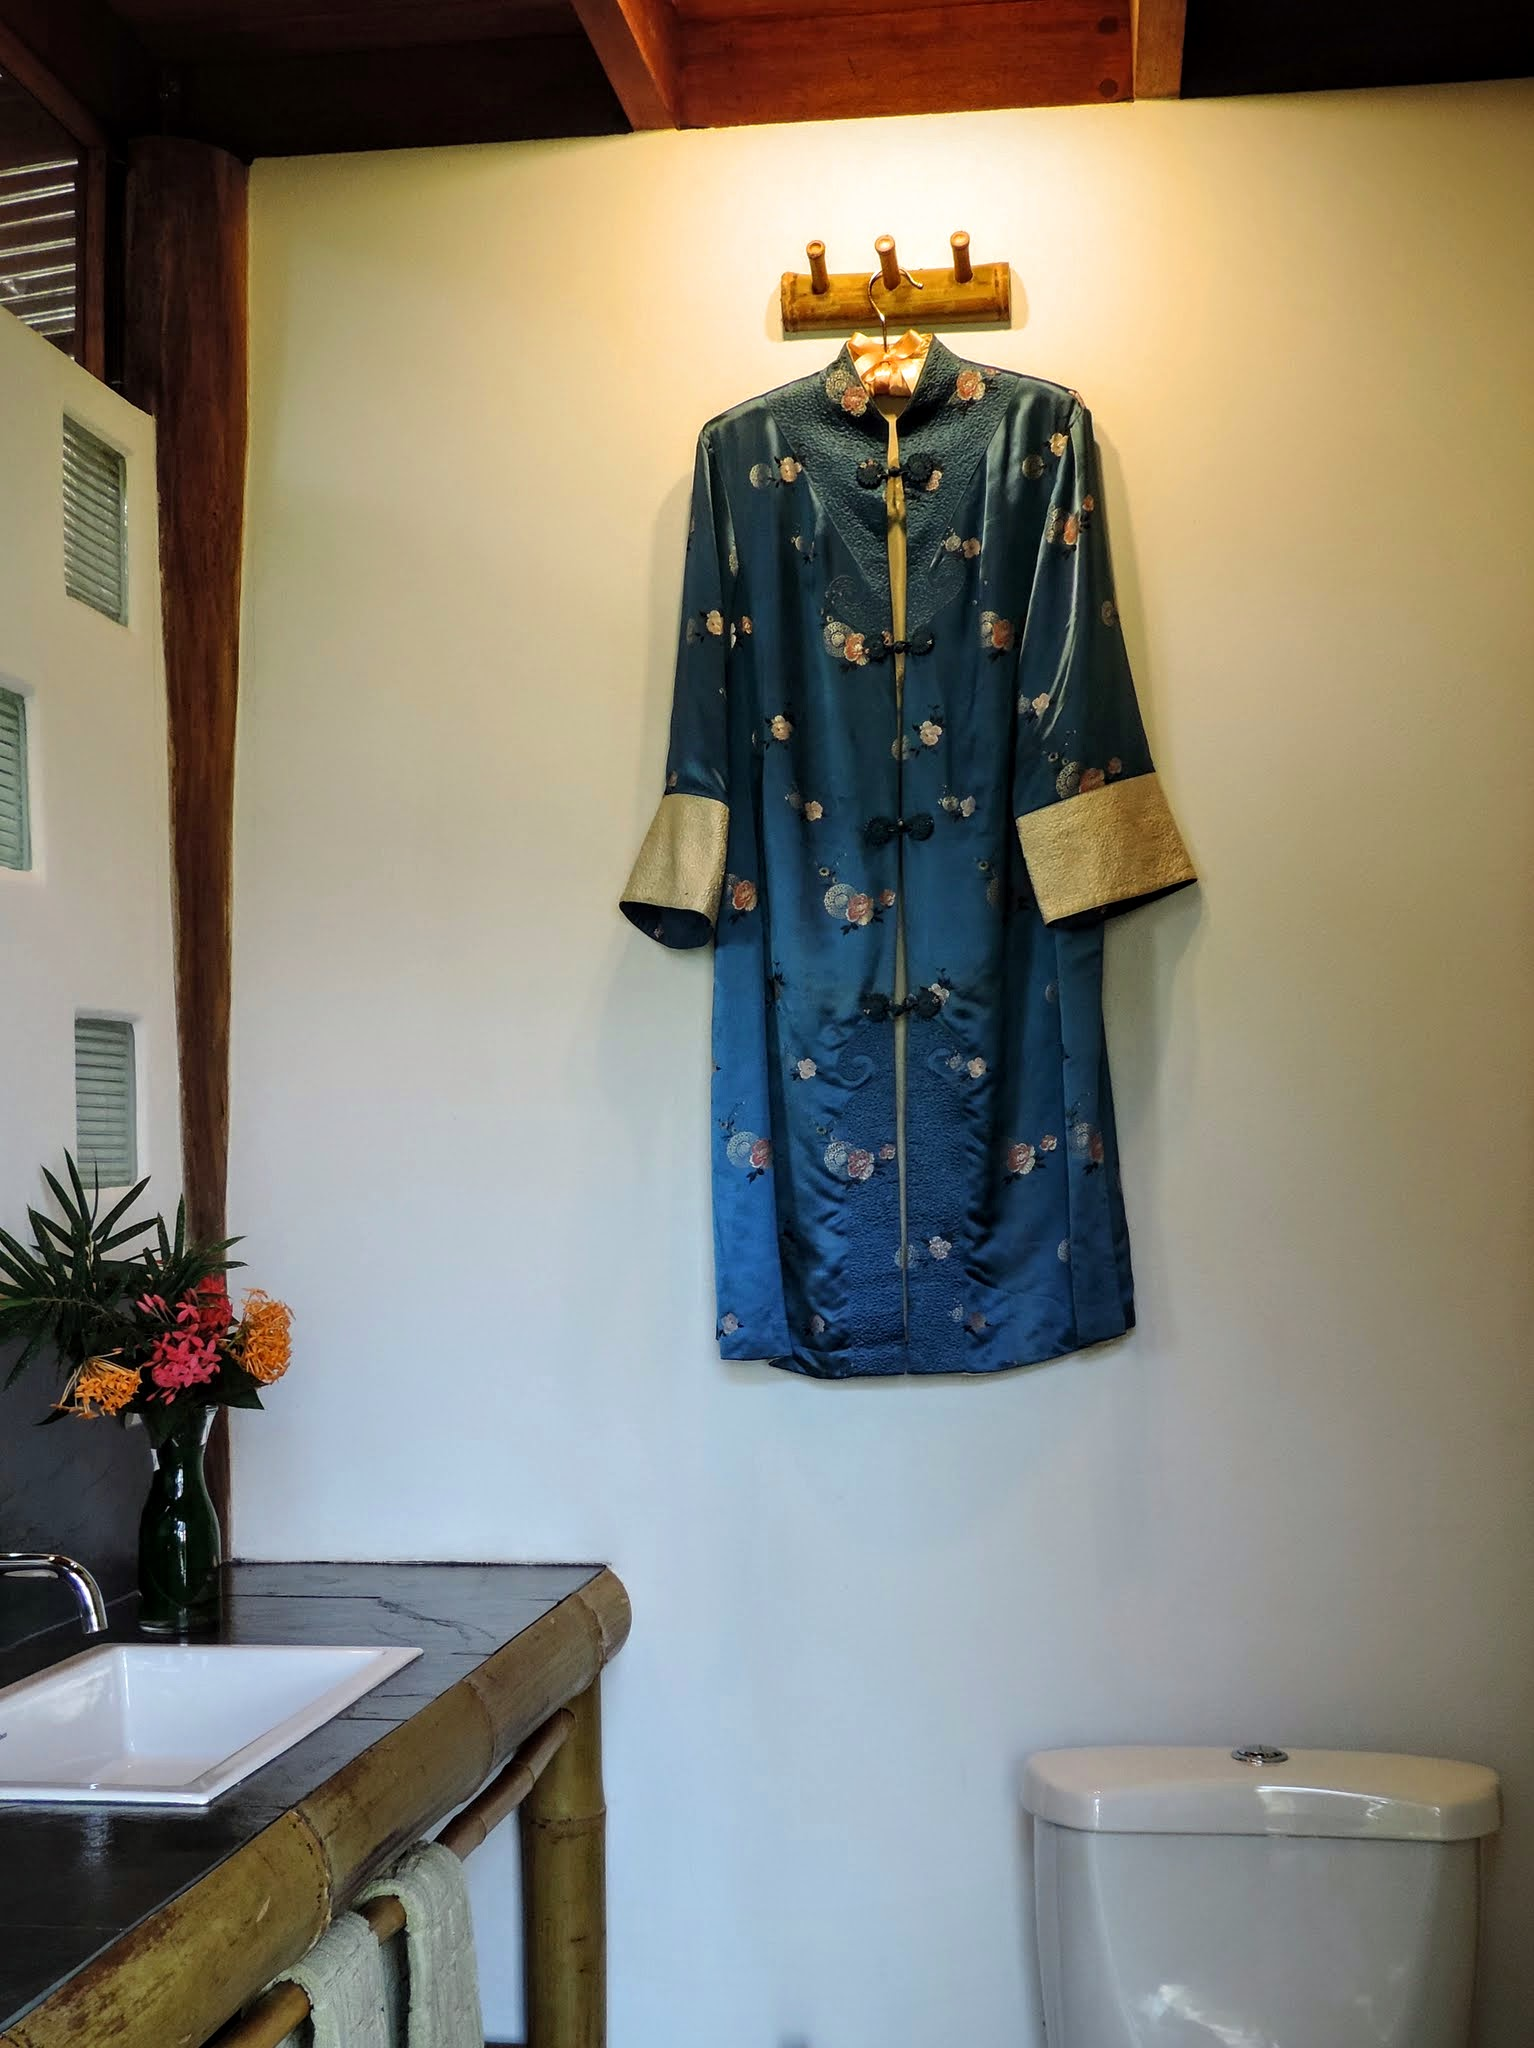 Detail - shared bathroom